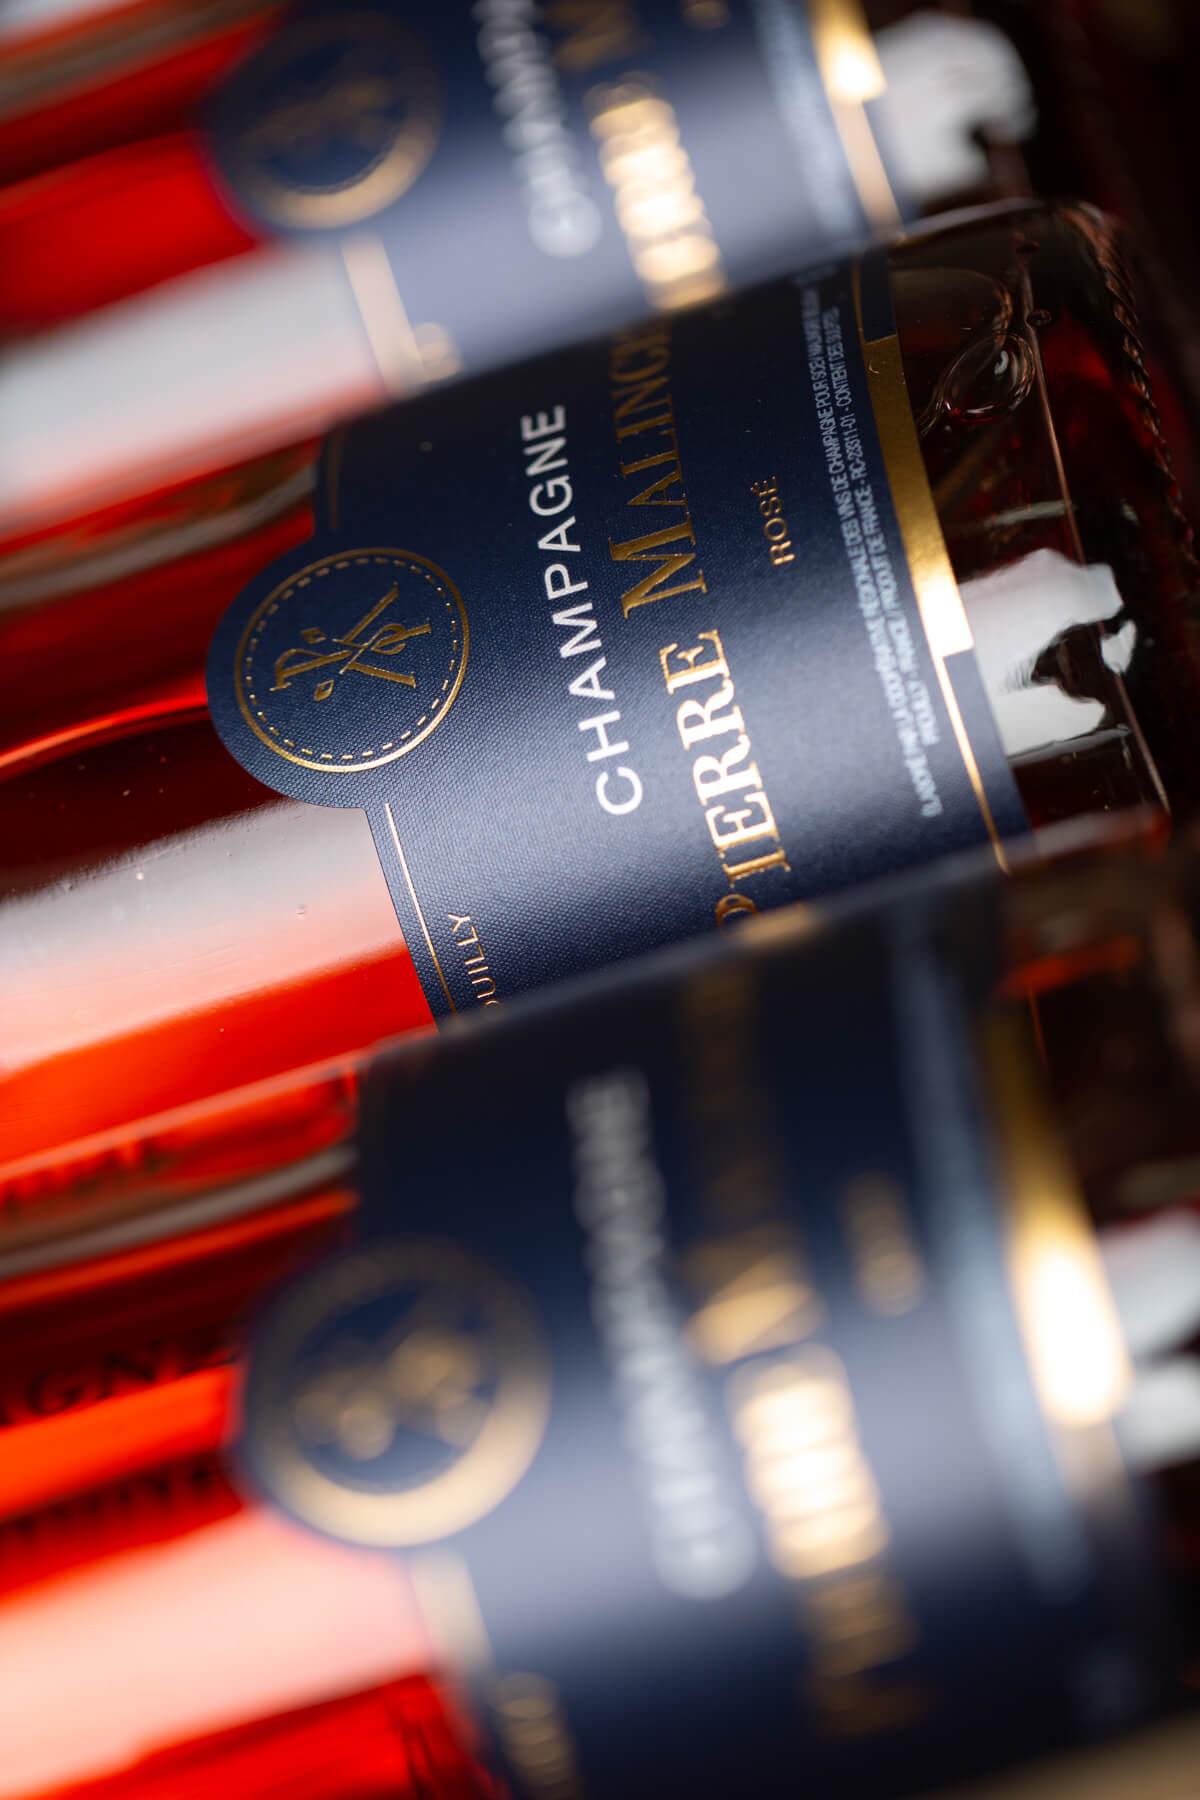 Photographe Champagne Epernay - Tristan Meunier - Champagne Malingre -4.jpg